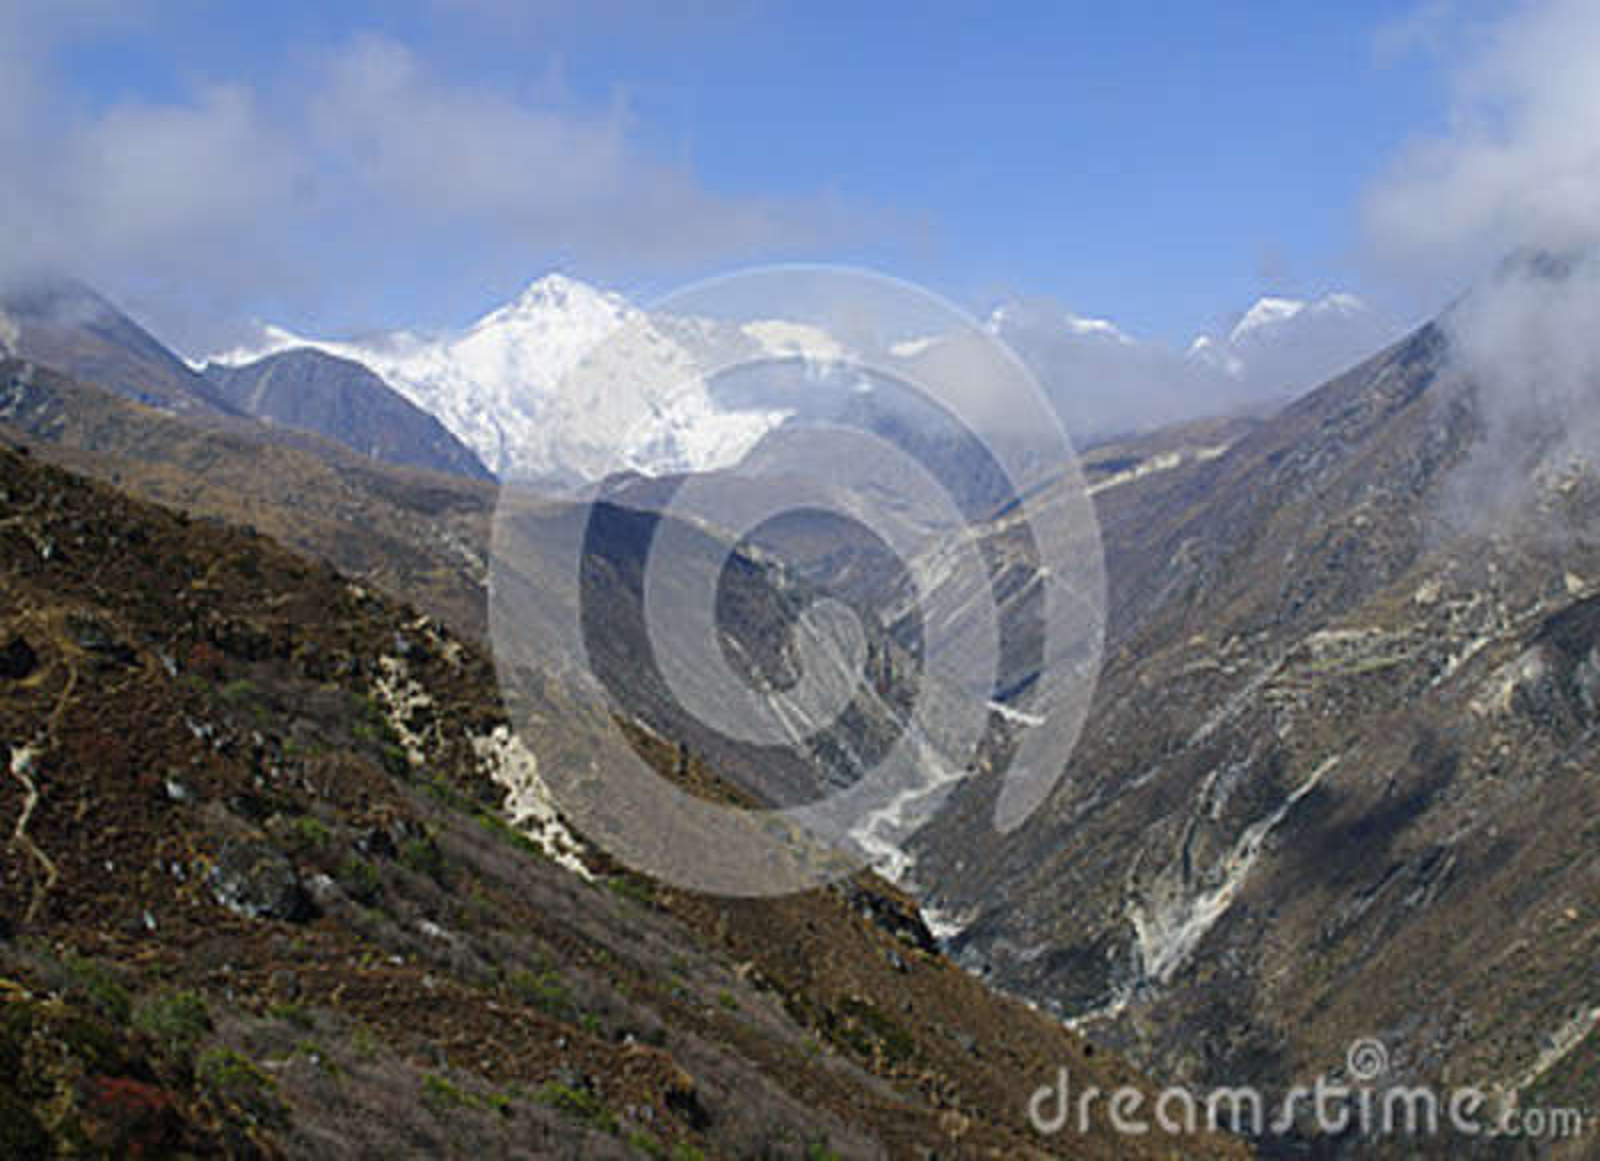 Montering Cho Oyu Gokyo Valley Nepal